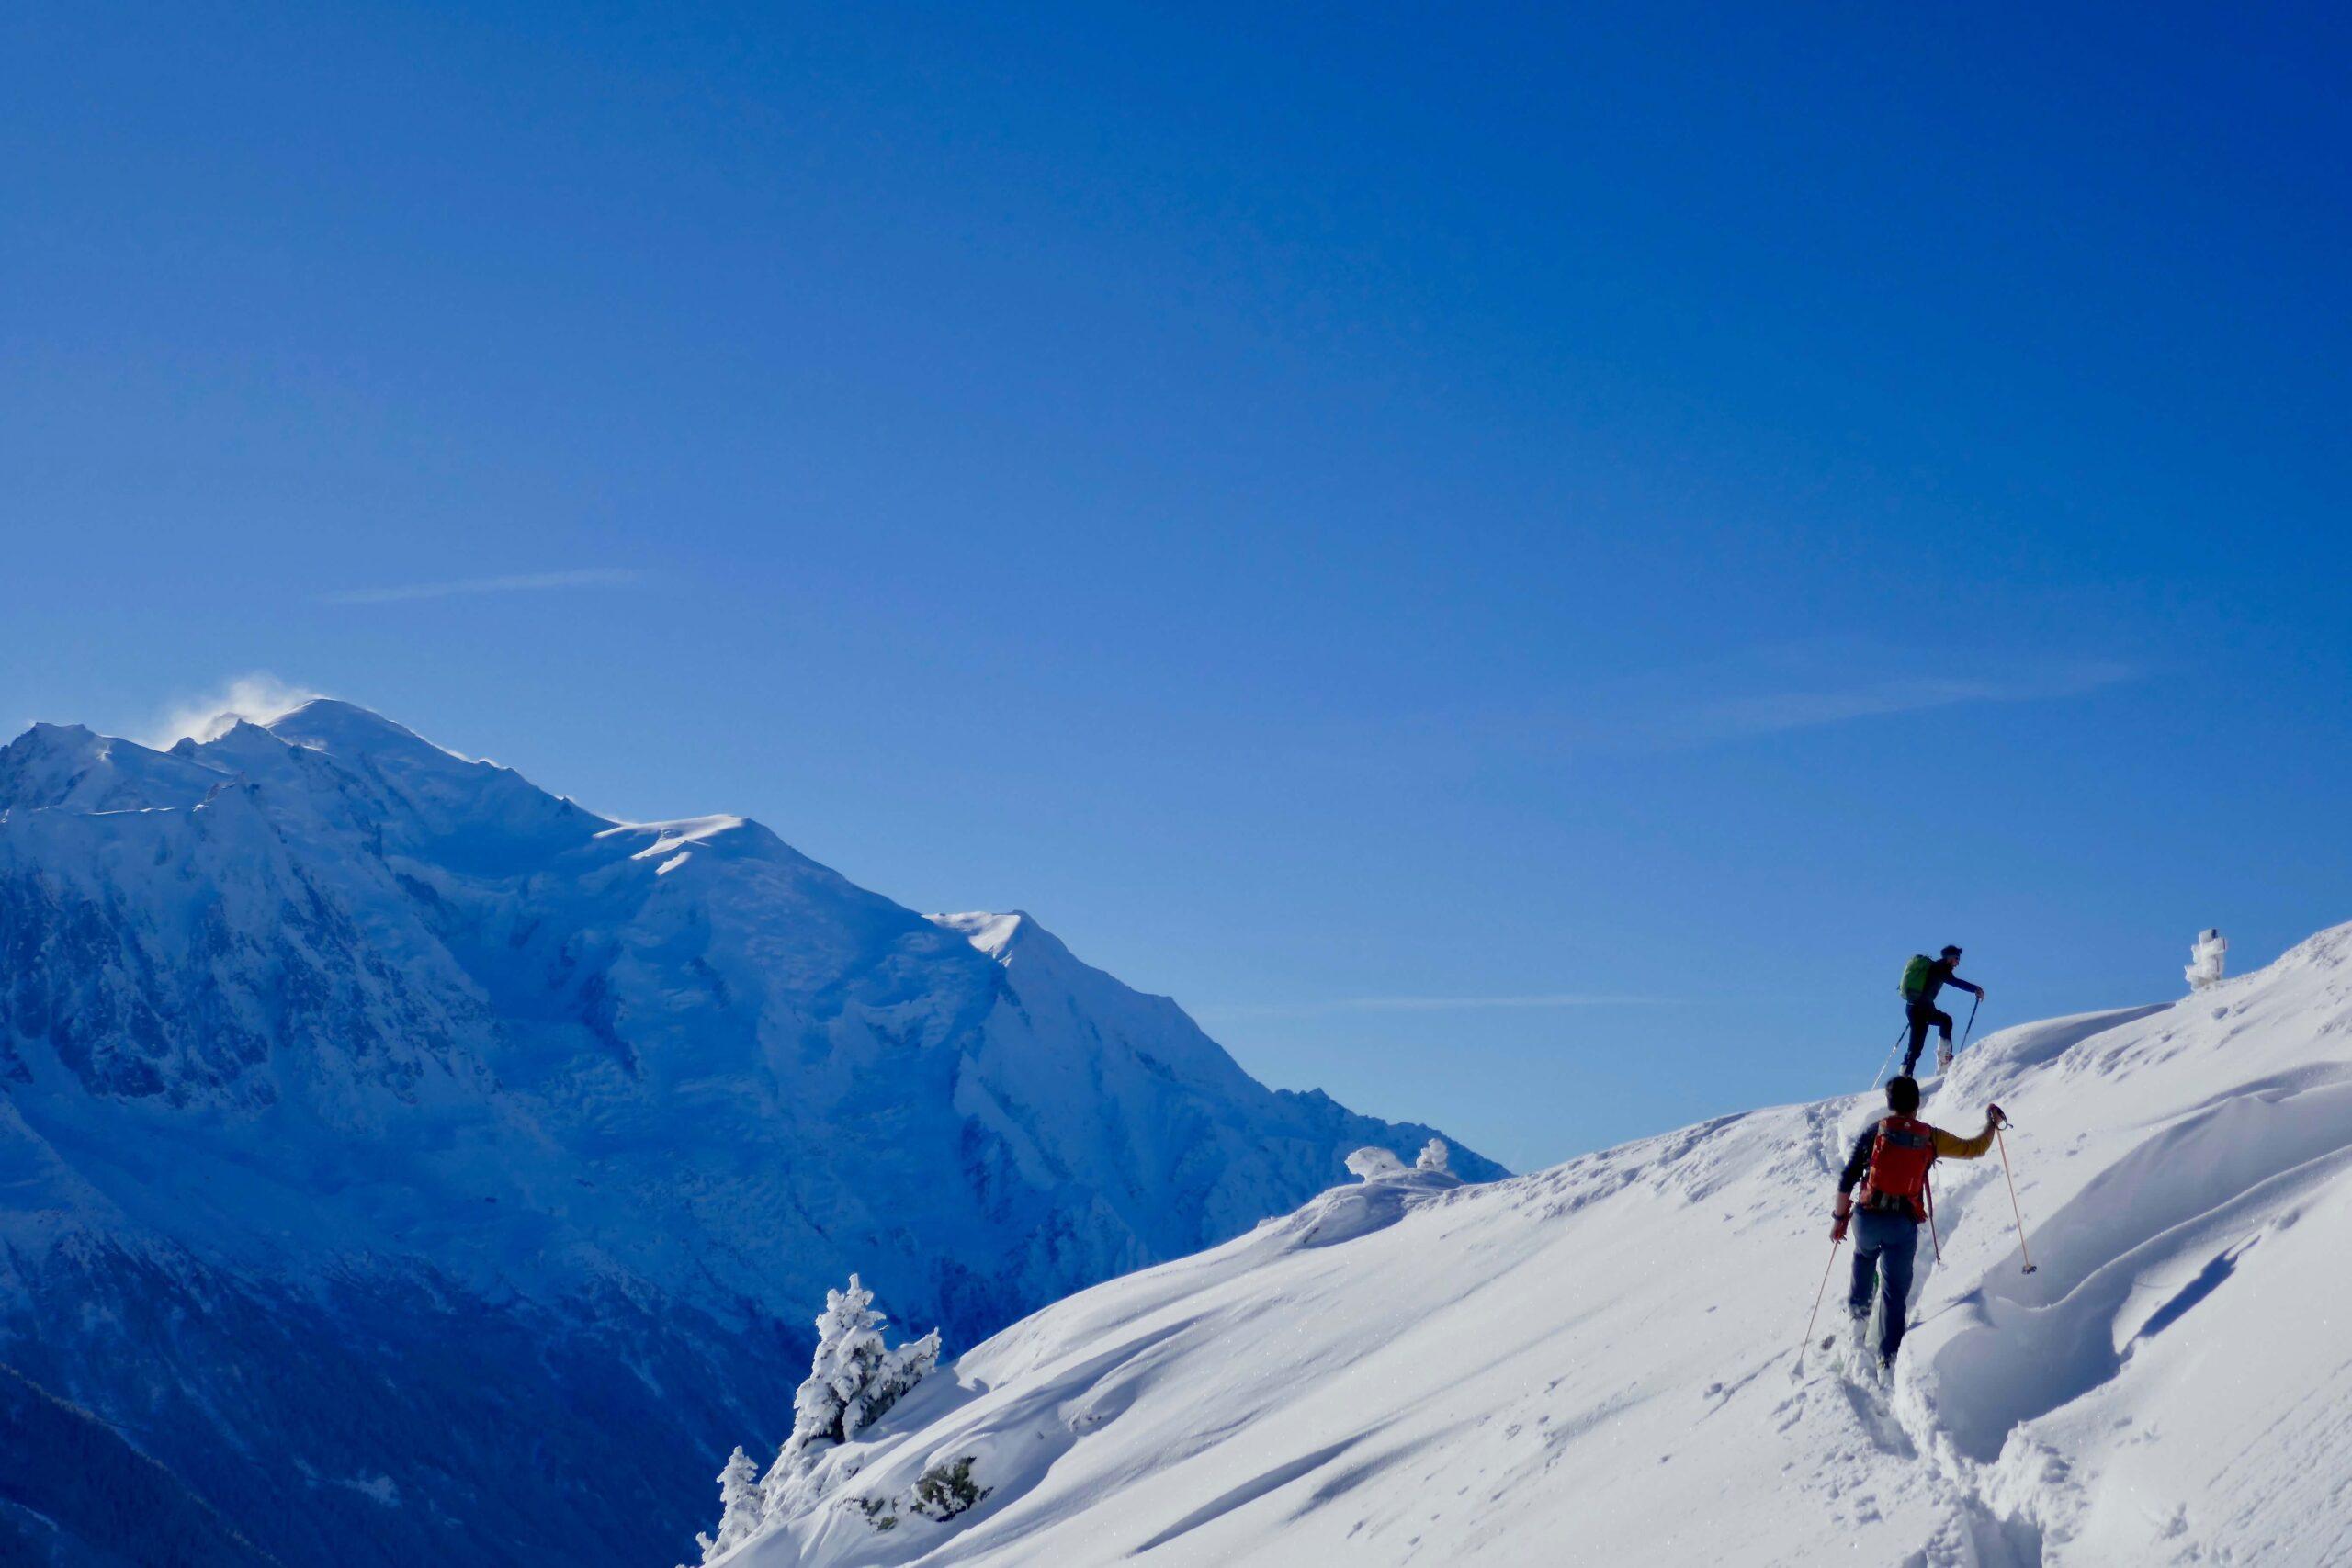 chamonix-skitouring-intro-course